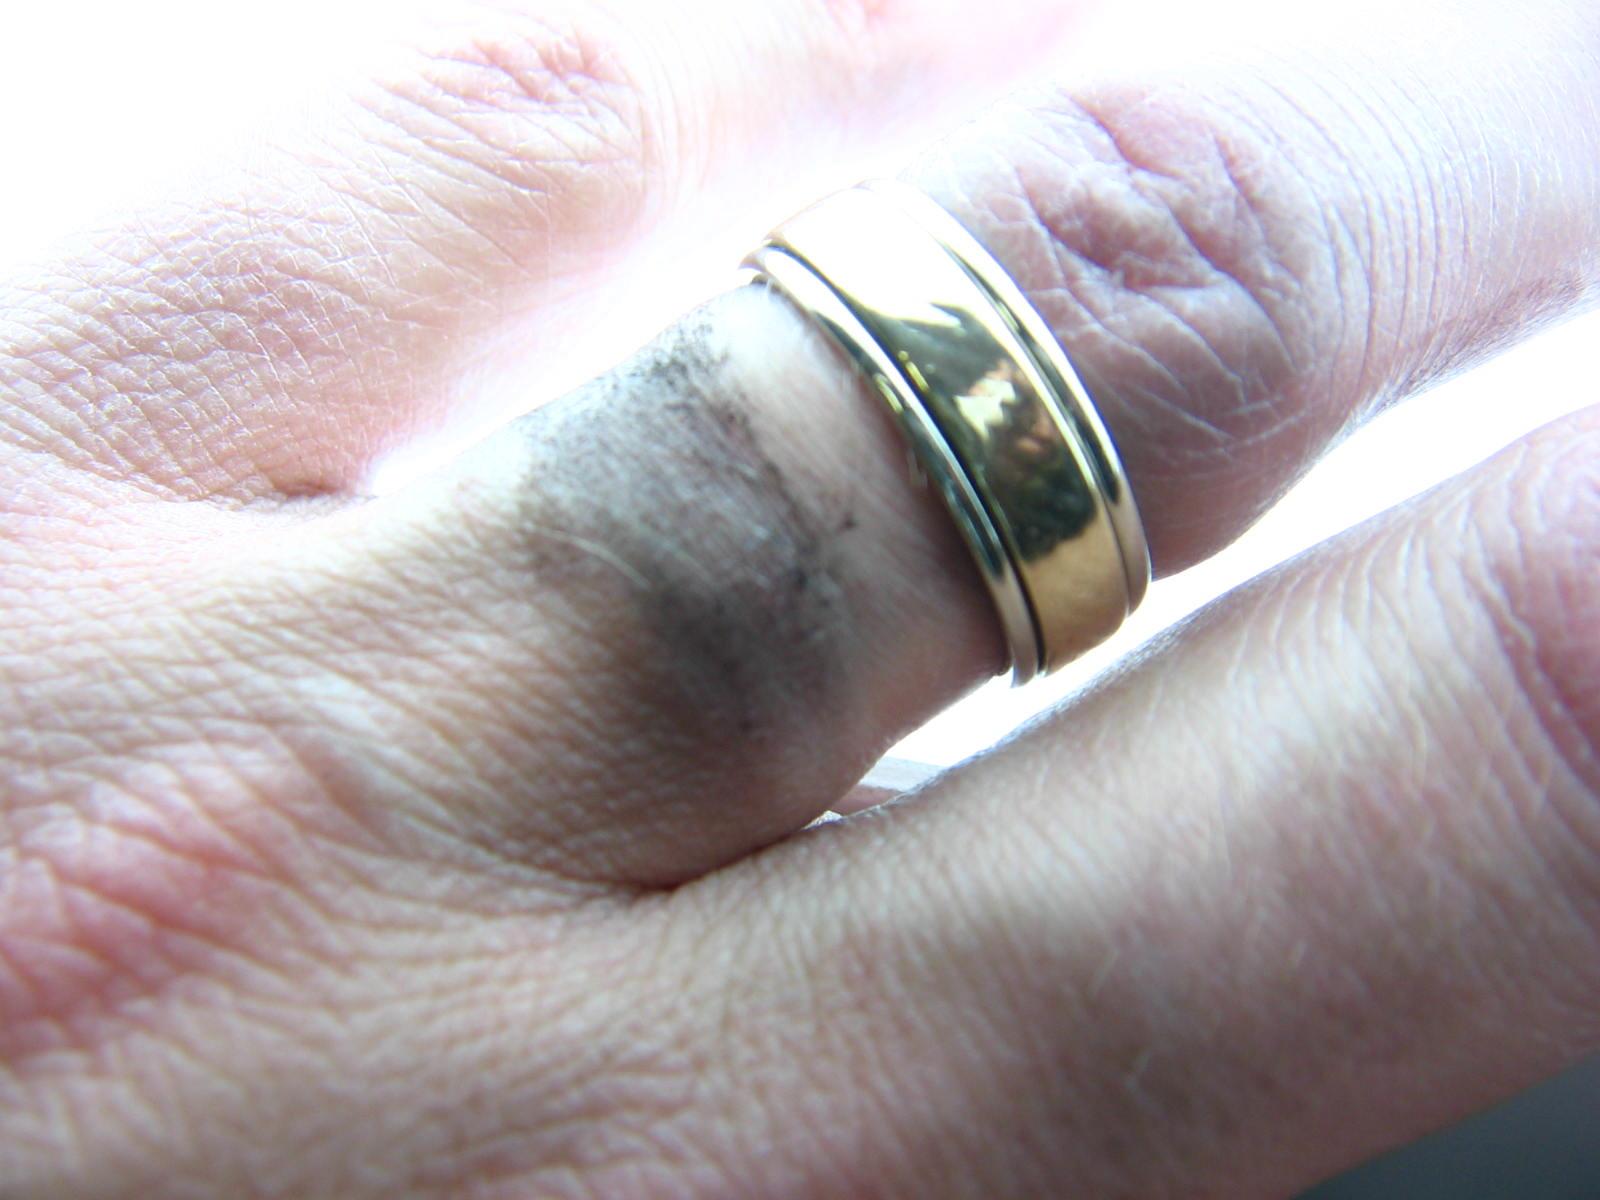 Jewellery Discolouring Skin